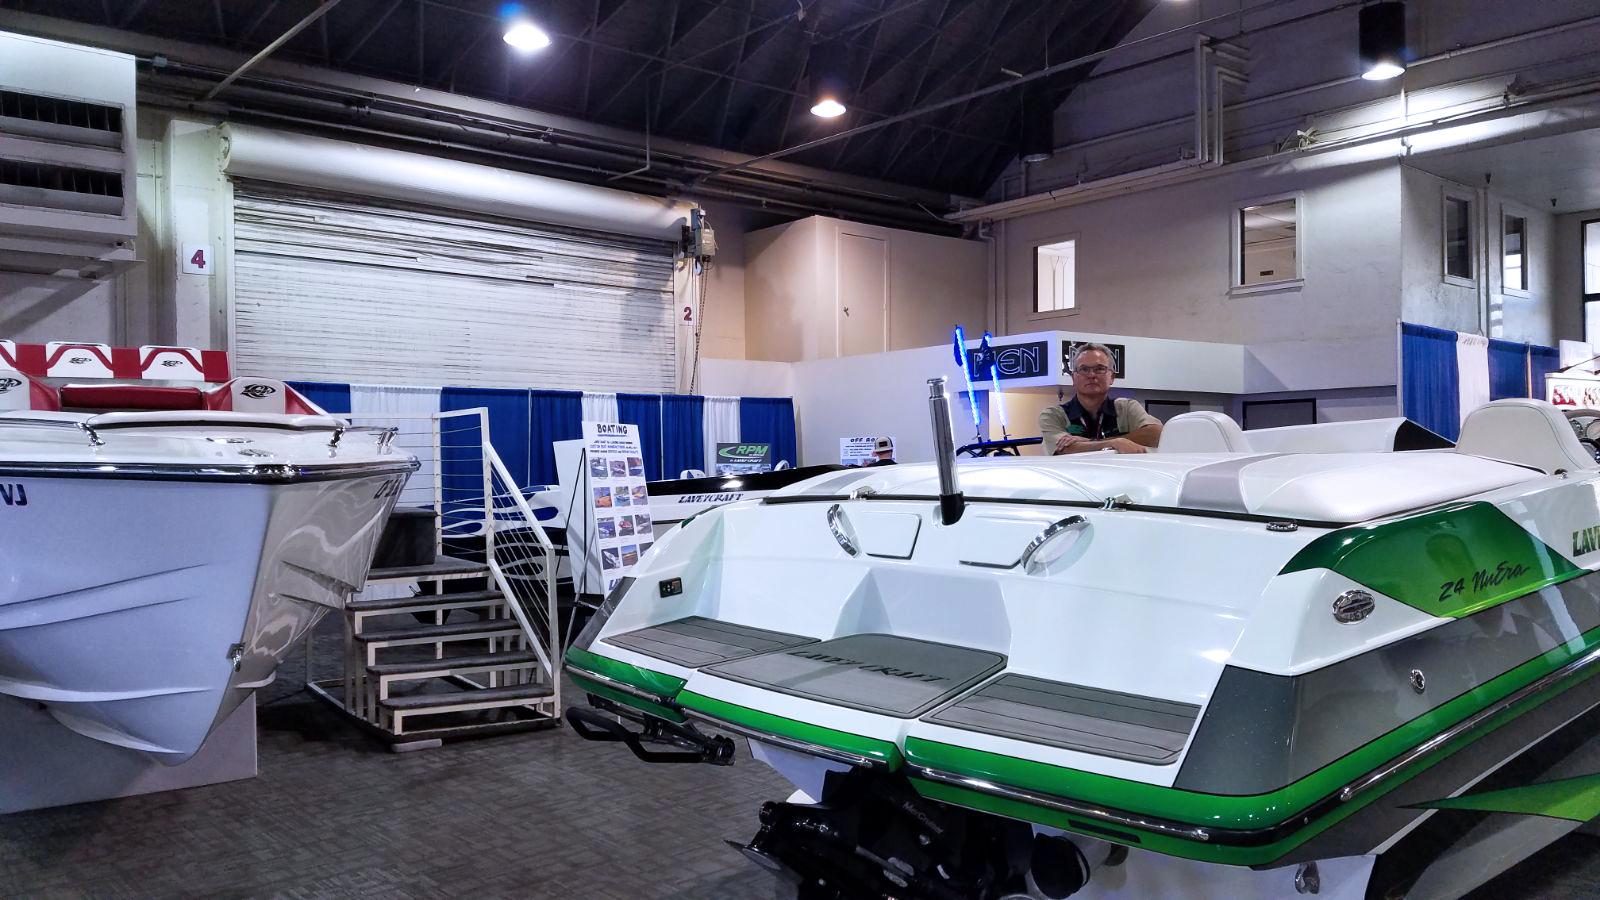 Lavey Craft LA Boat Show 2019 pic 2.jpg